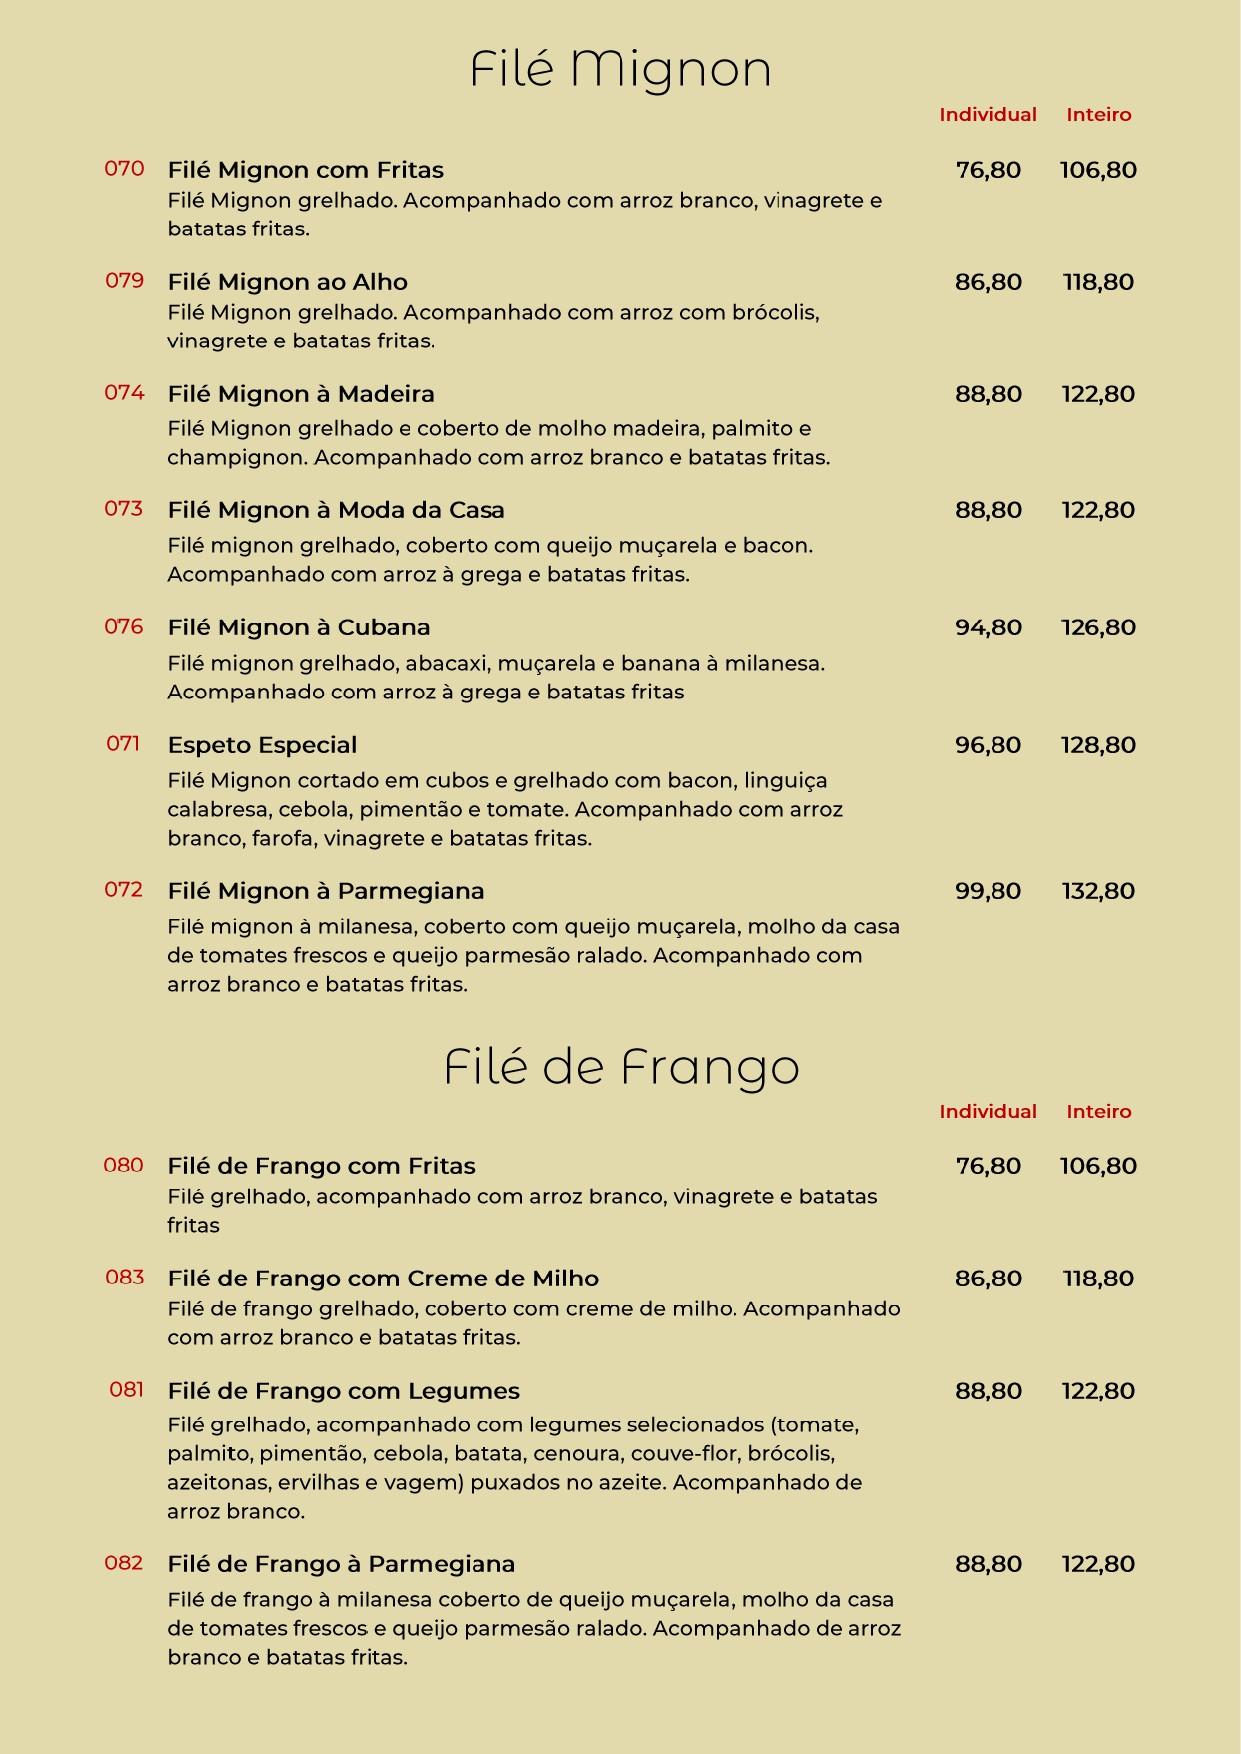 Cardápio Digital_page-0012.jpg